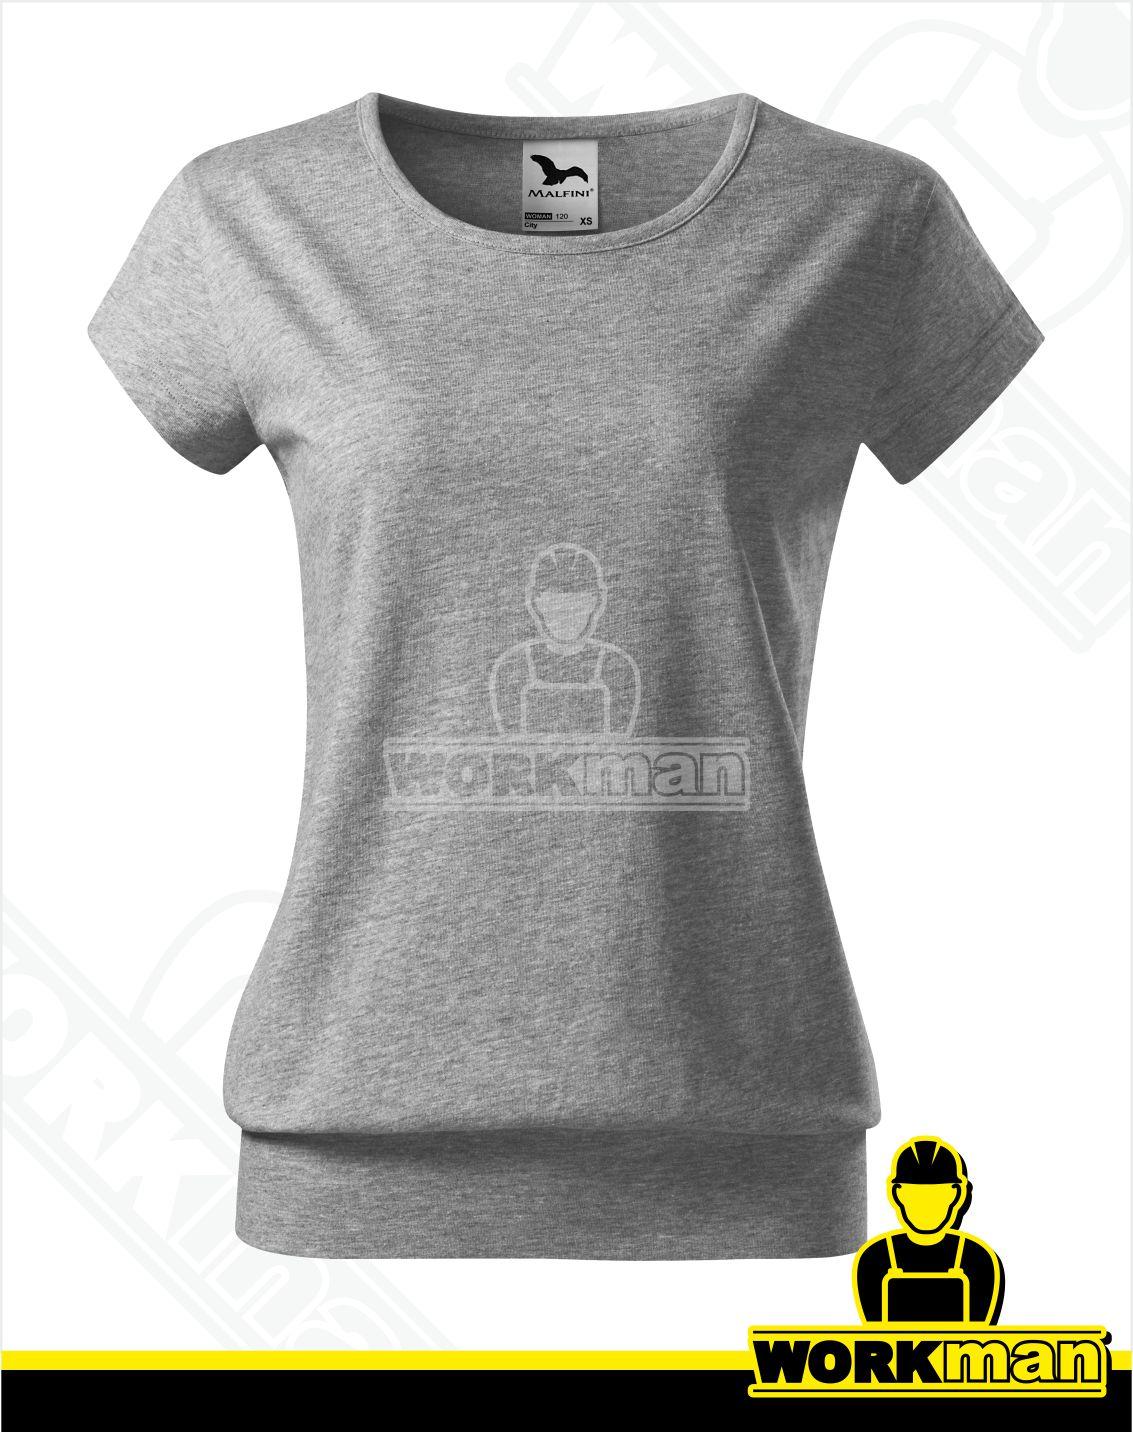 fdb95bd99022 Dámske tričko CITY Malfini Pracovné odevy WORKMAN